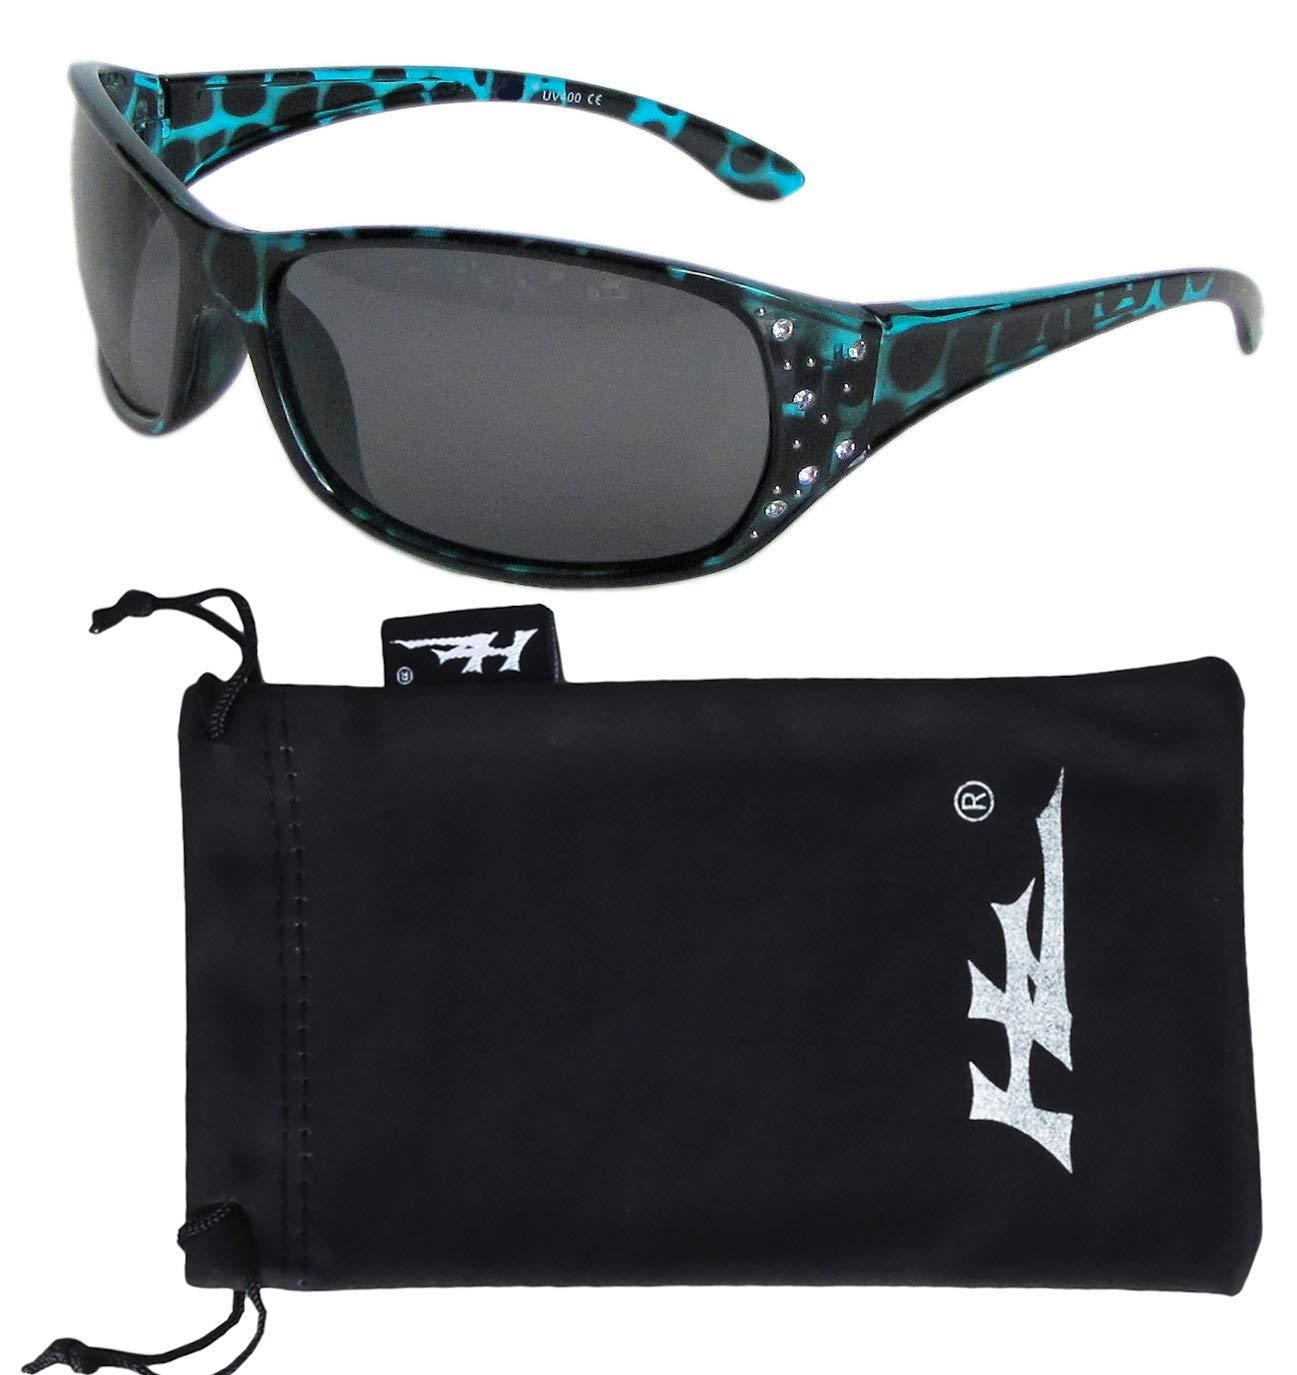 Hornz HZ Serie Elettra – Gafas de sol polarizadas para mujer product image